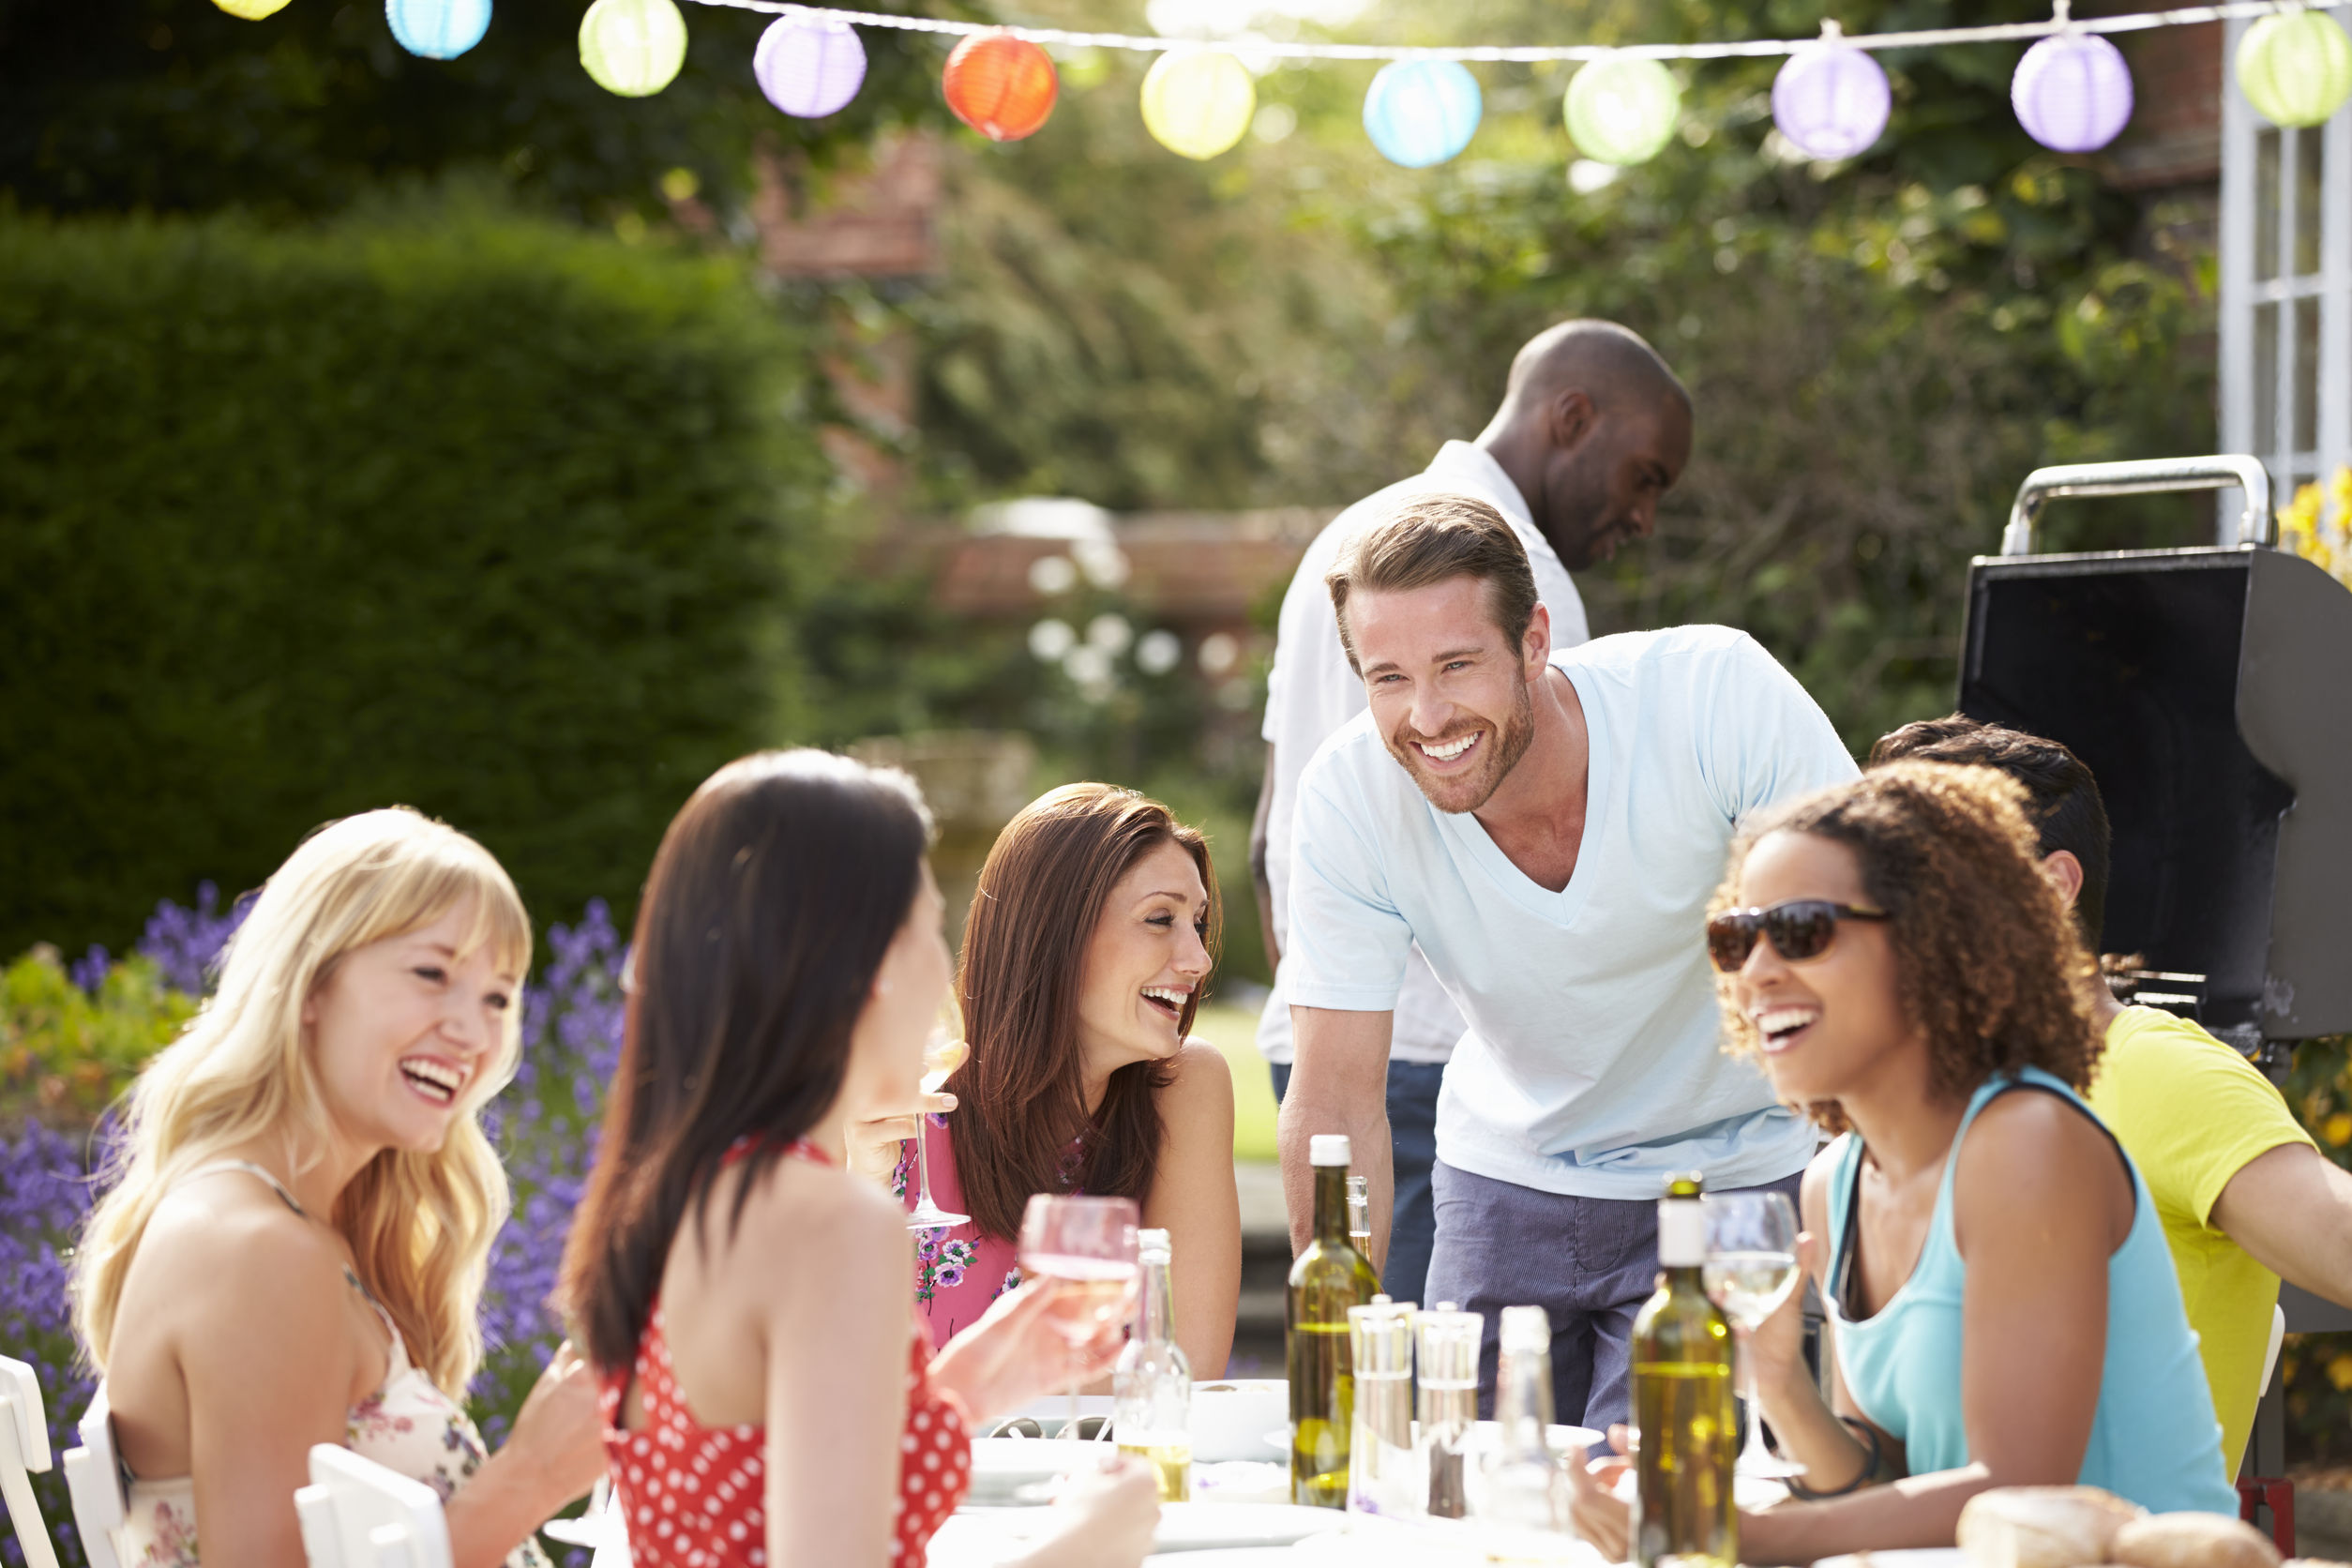 outdoor birthday party ideas